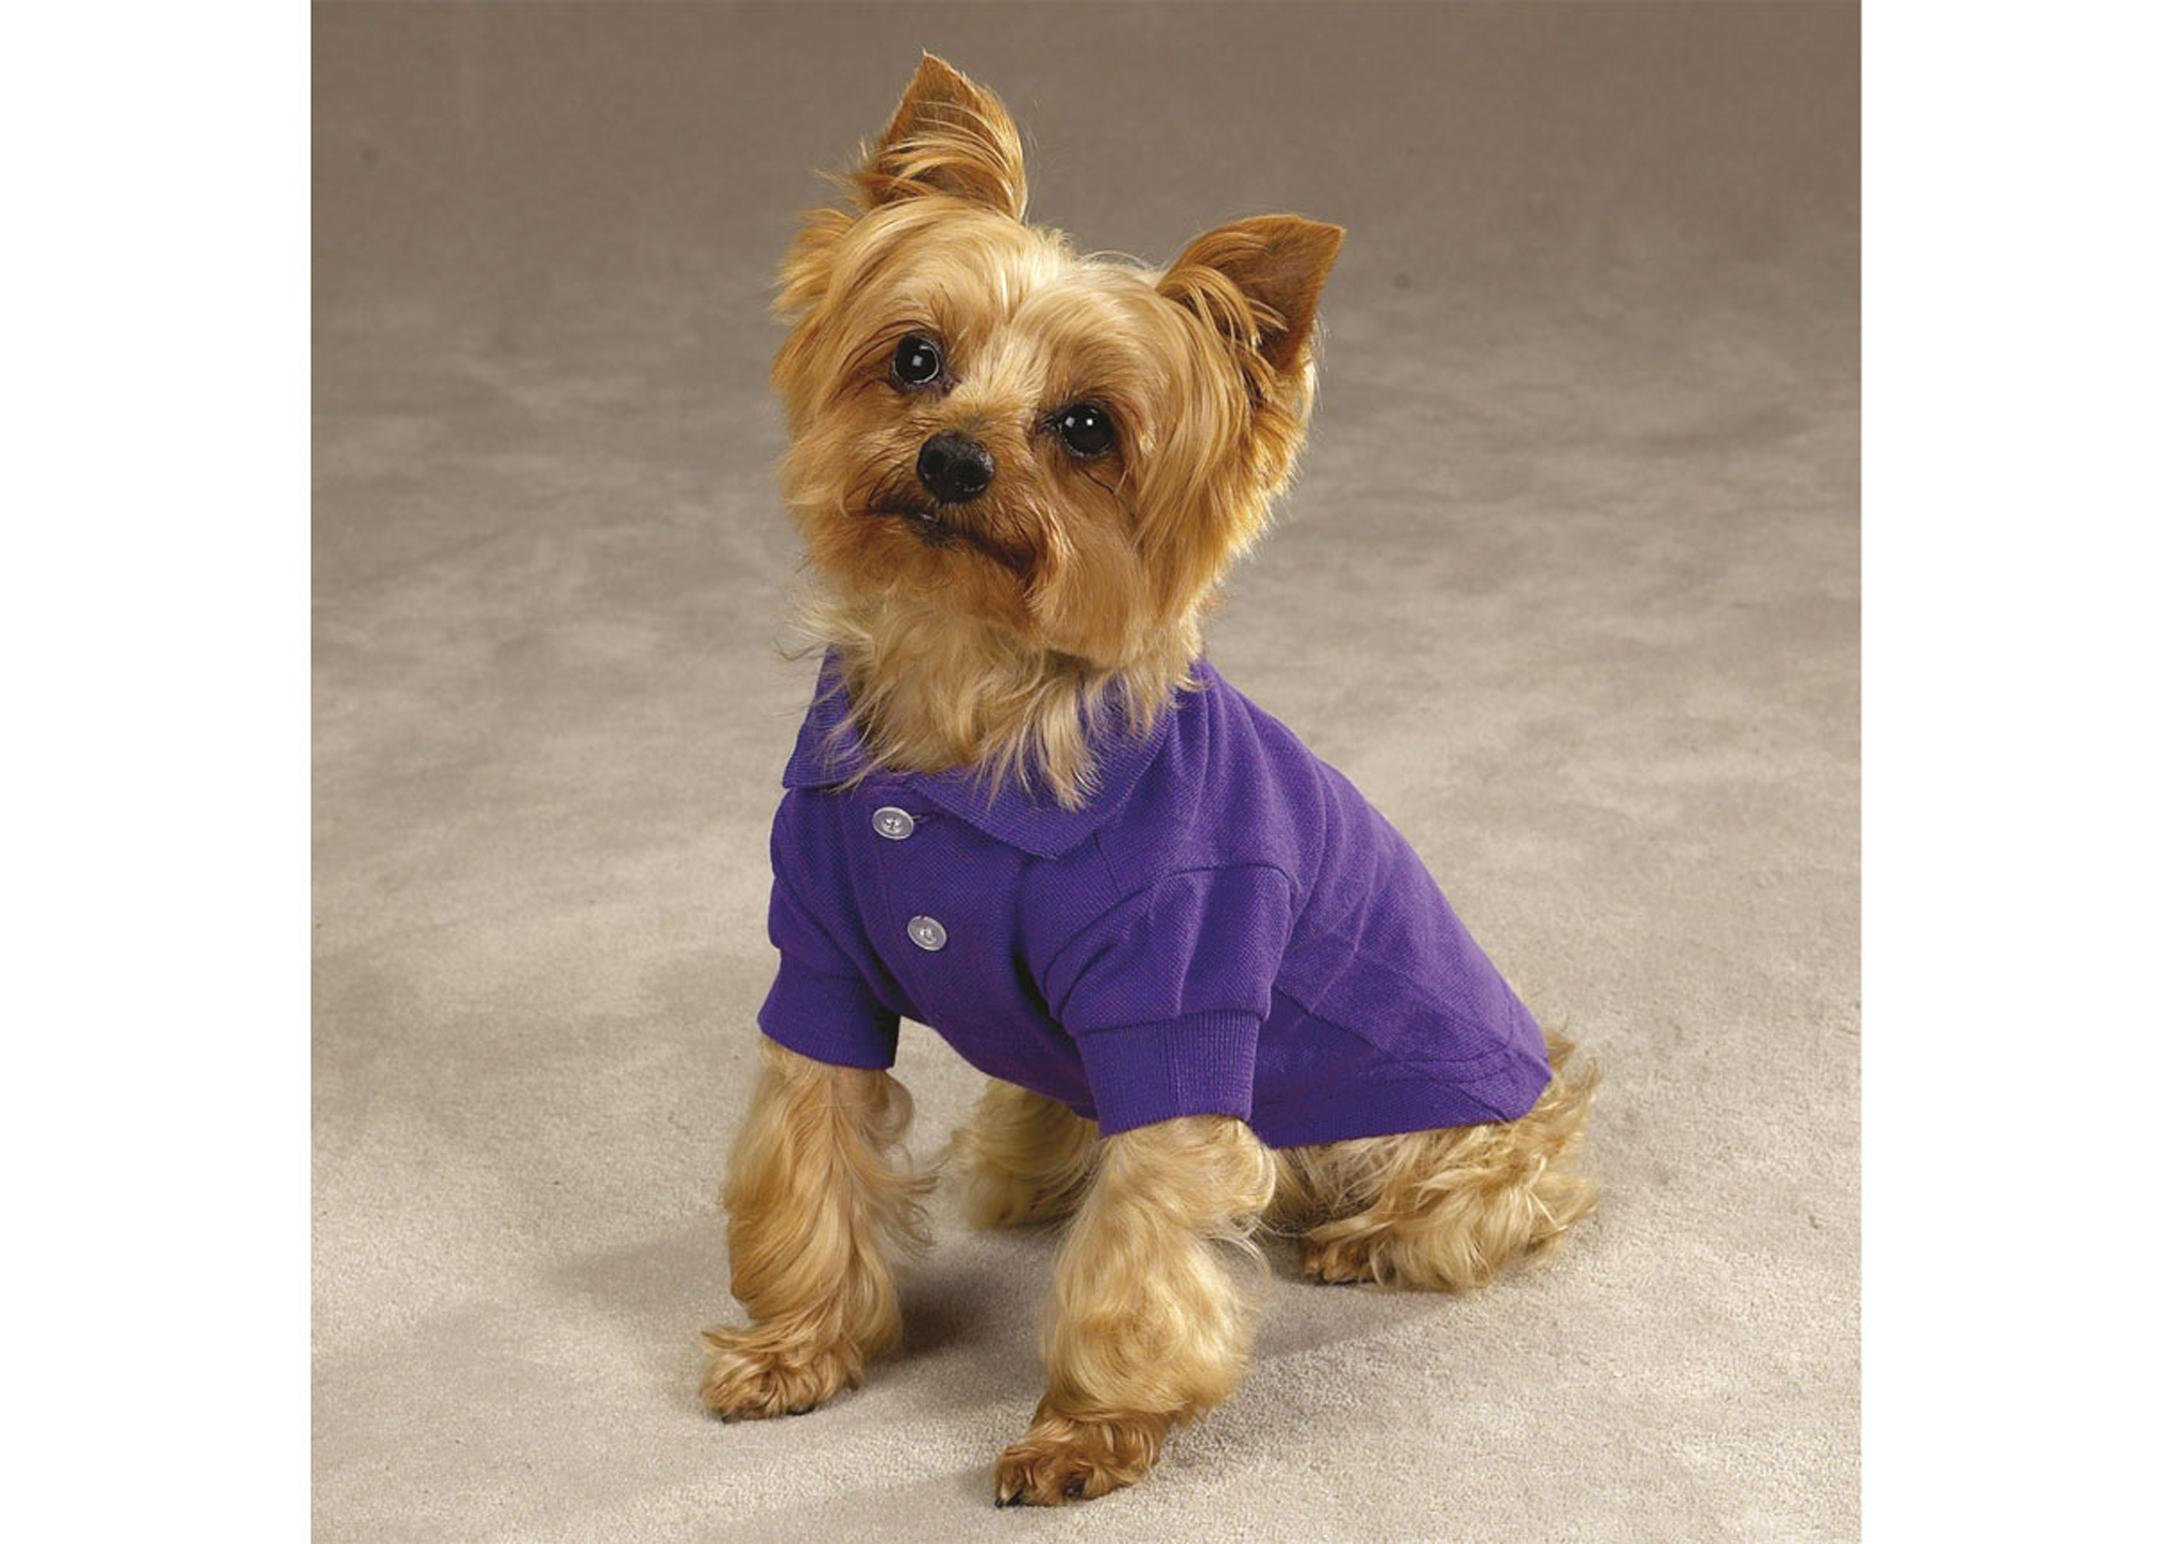 Zack & Zoe Zack&Zoey Polo Shirt Attire For Dogs